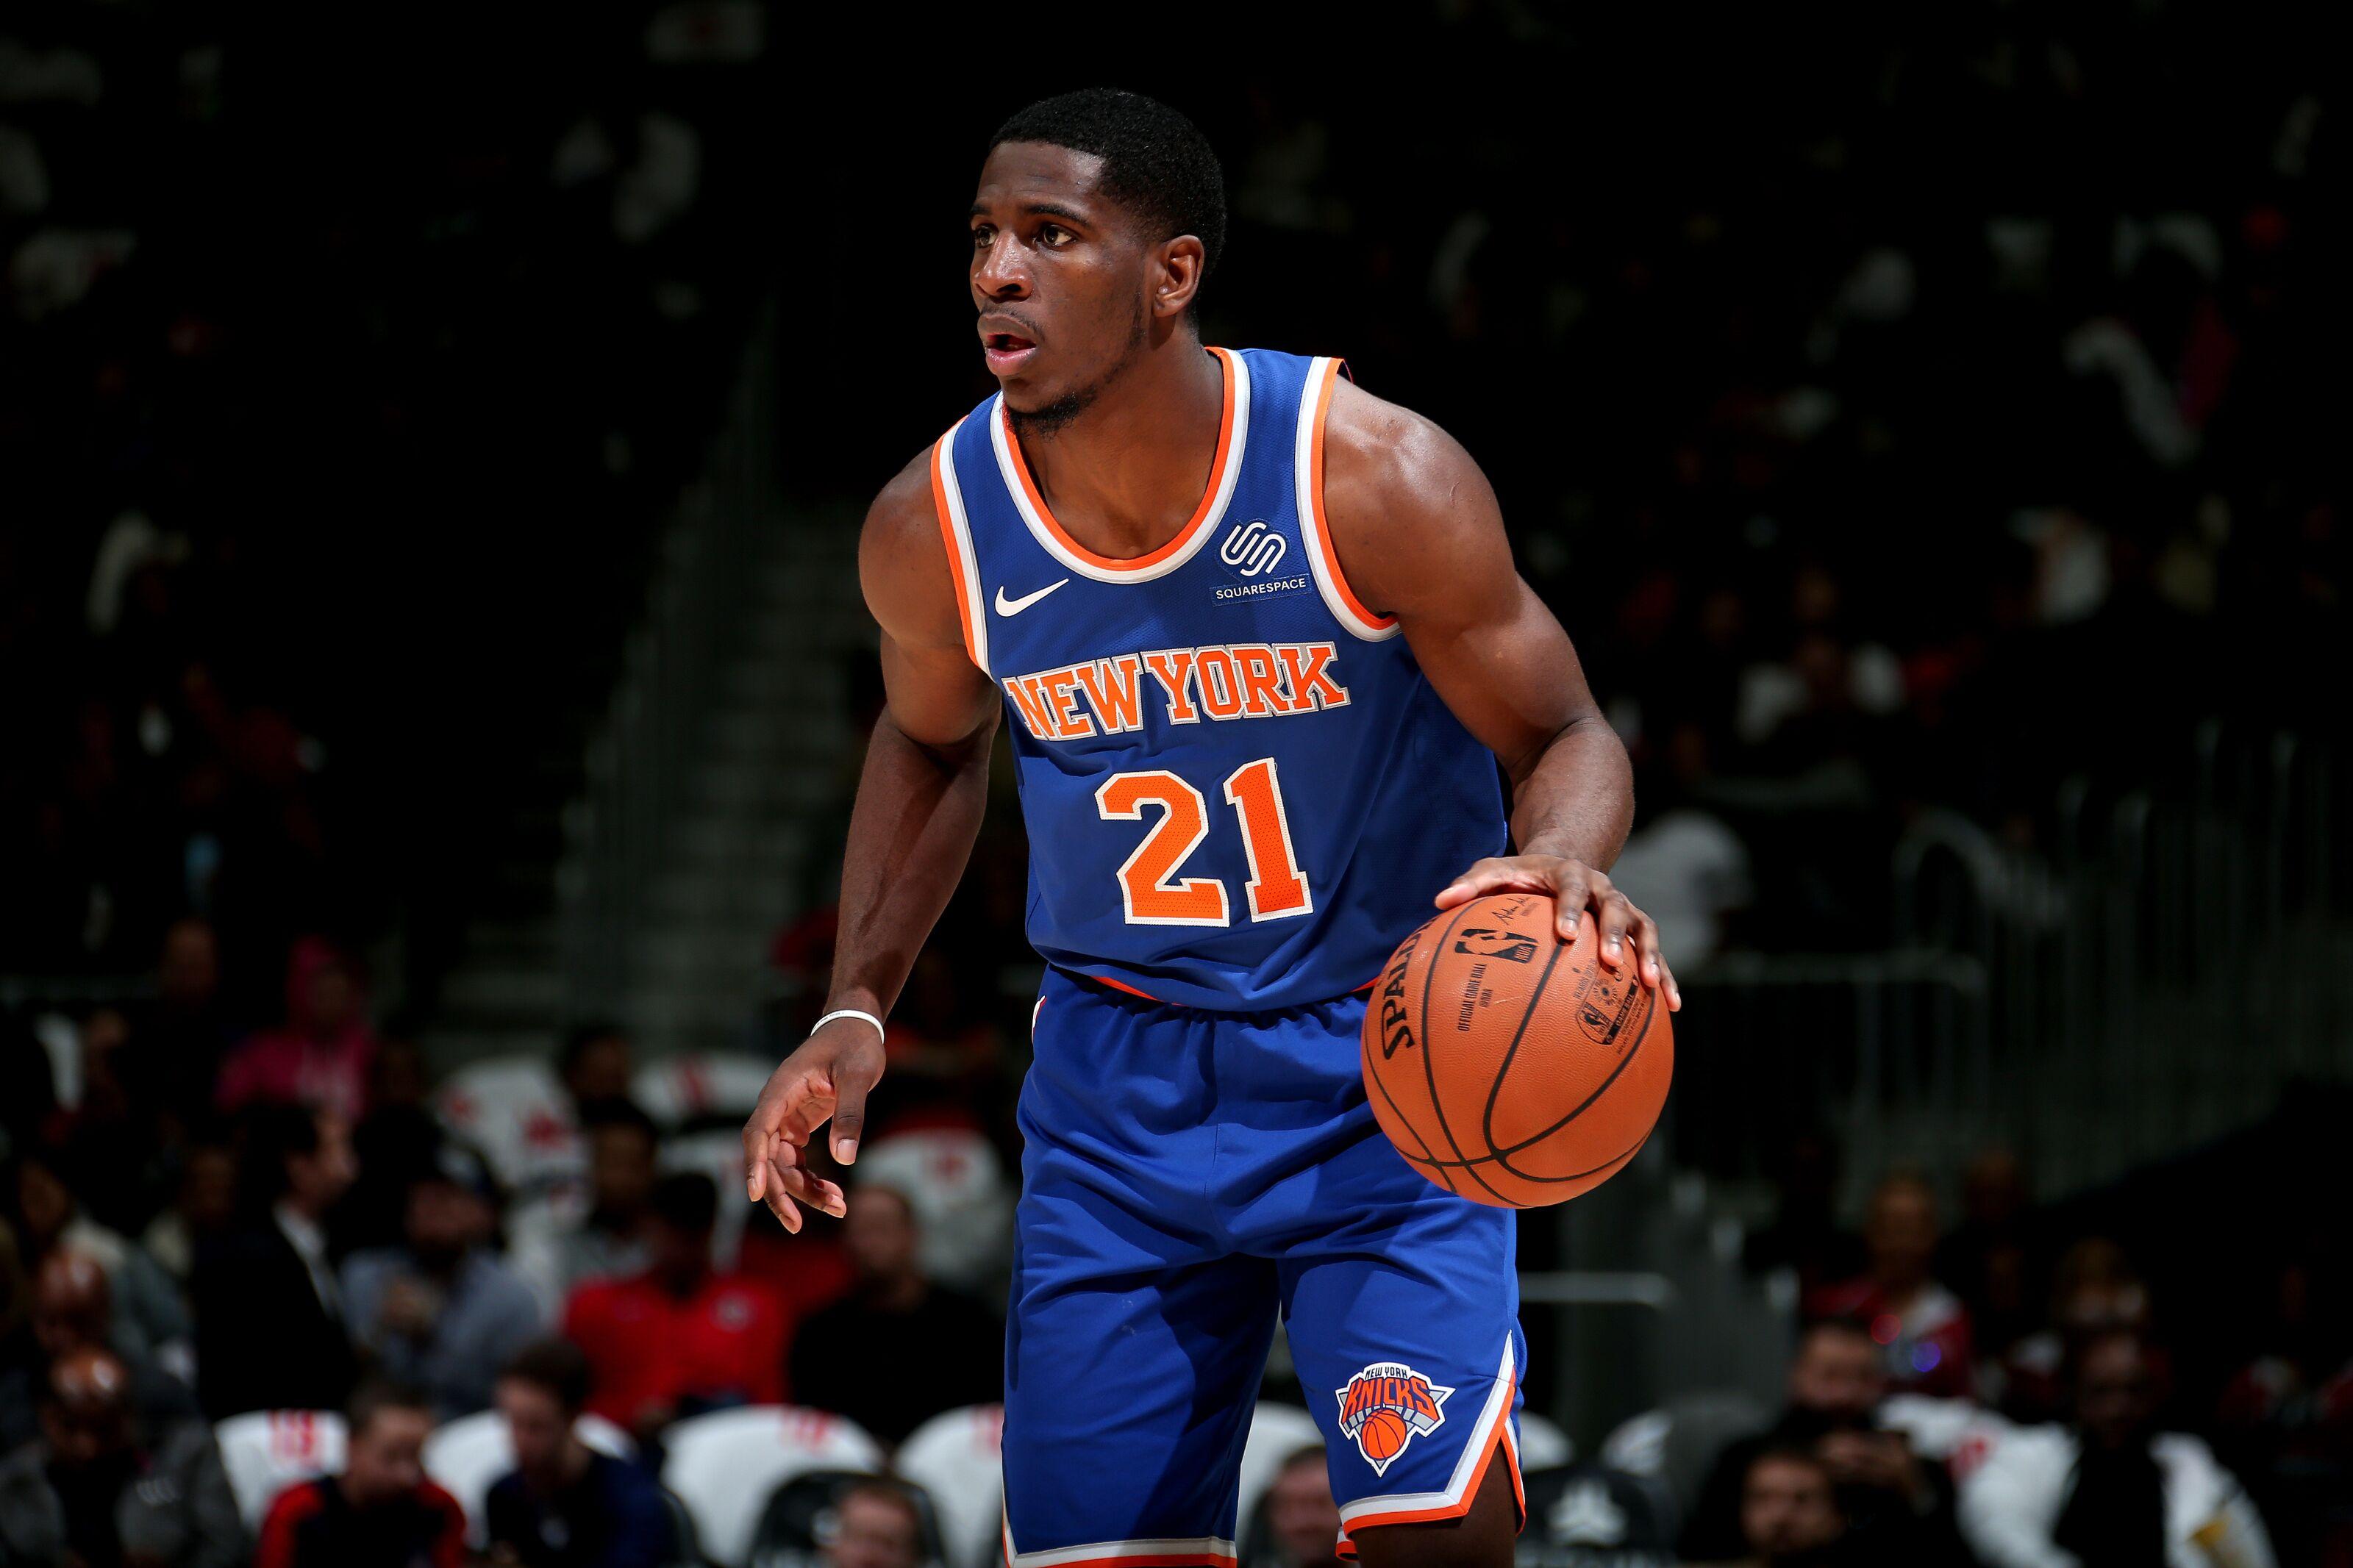 New York Knicks: New York Knicks: Ranking Phil Jackson's Draft Pick Selections